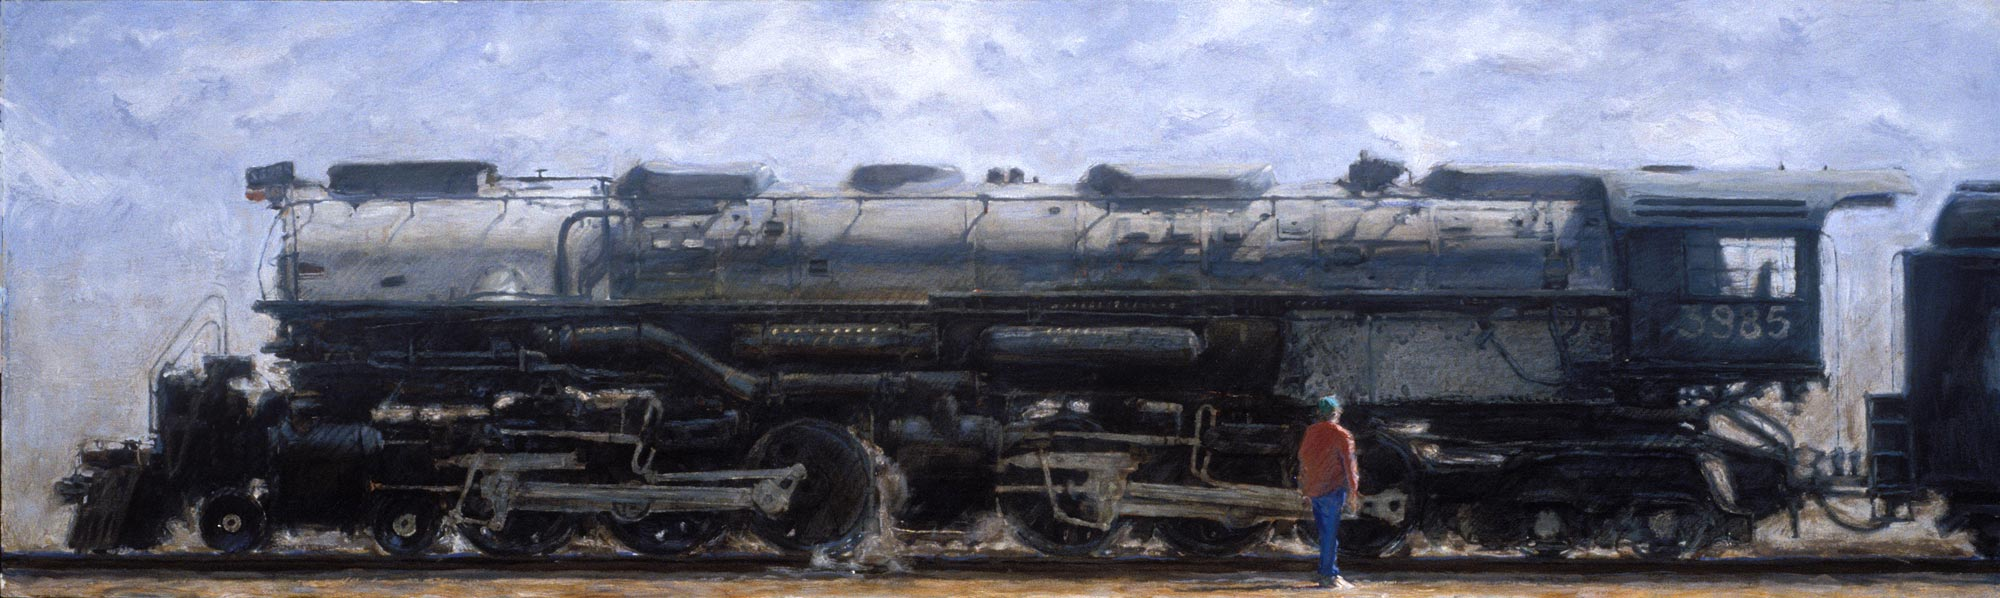 U P Challenger 3985, 19 x 63, oil on canvas, 1995